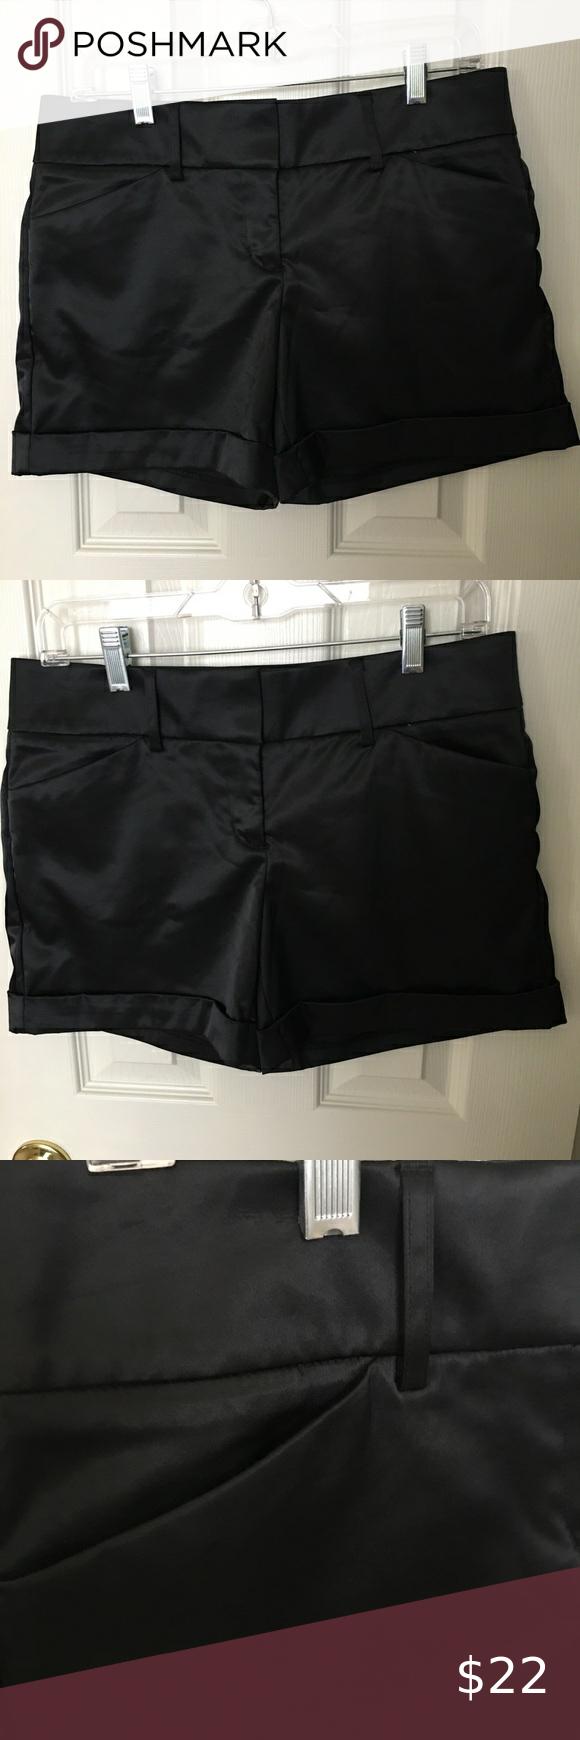 Express Shiny Black Satin Cuffed Shorts Size 6 Fashion Clothes Design Fashion Design [ 1740 x 580 Pixel ]